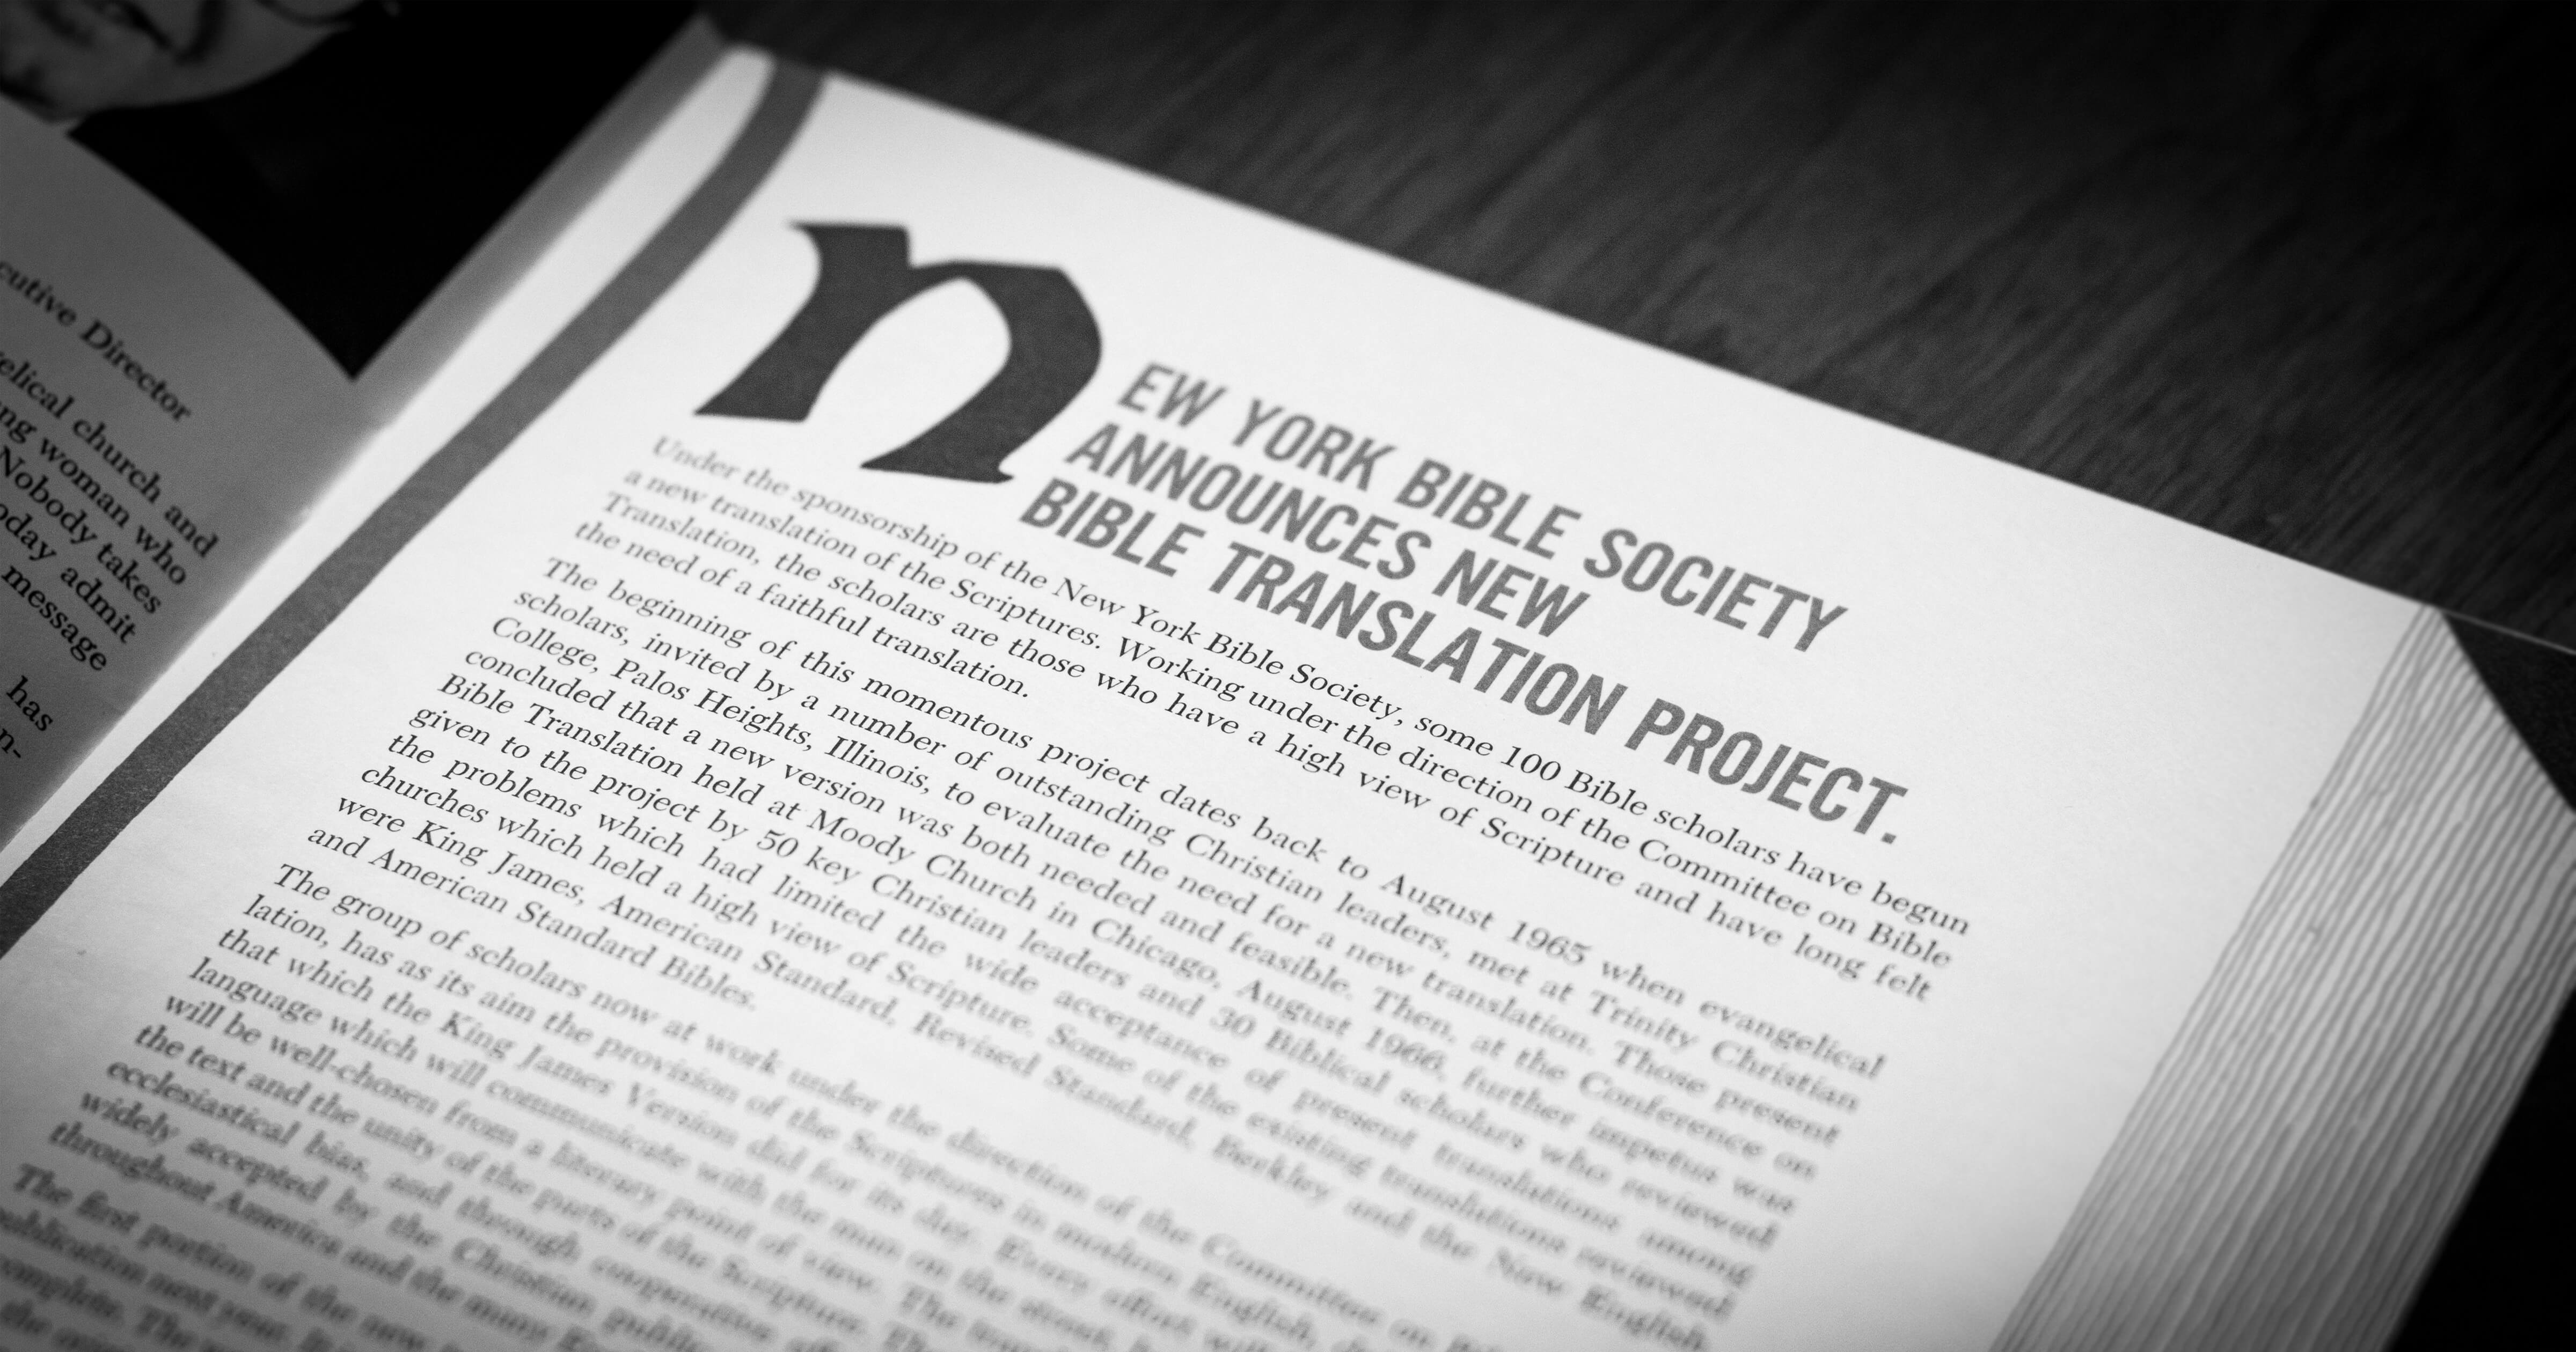 NIV Bible Translation Process | Biblica - The International